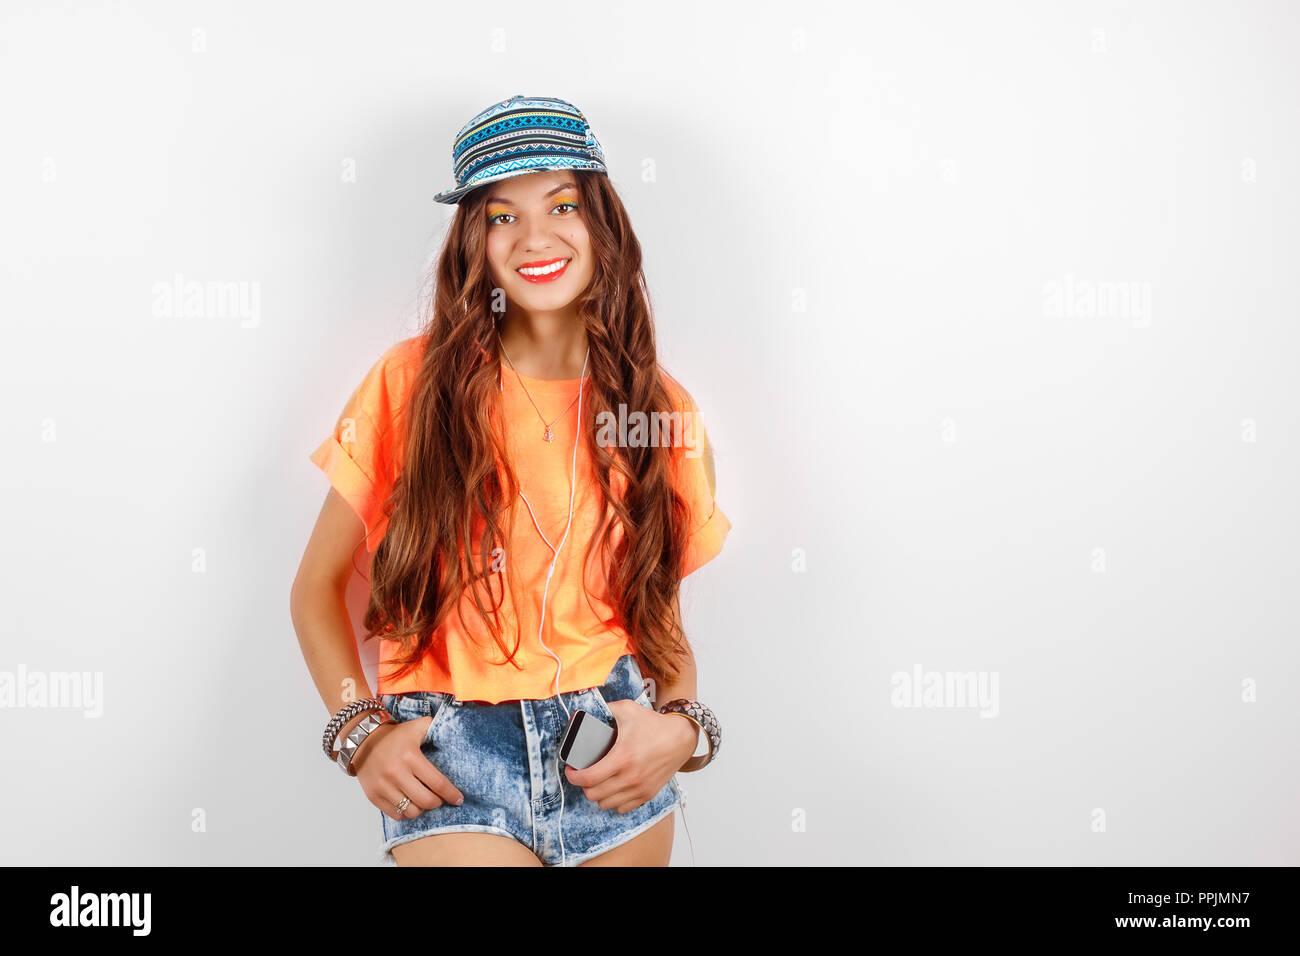 beautiful woman in sunglasses wearing in black hat and orange T-shirt  listening music near 99c05ef55836